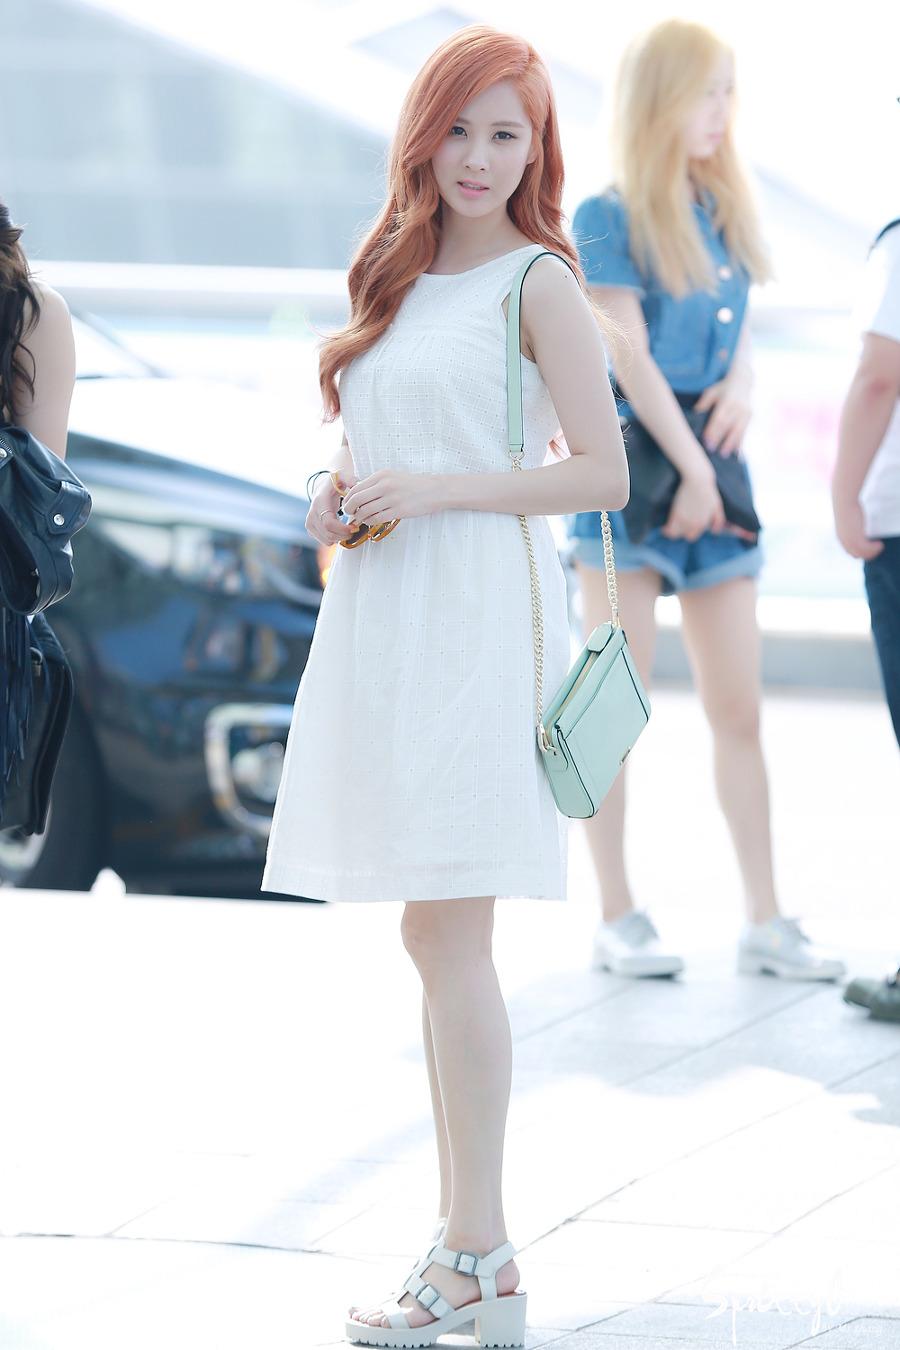 150610 Incheon Airport 서현 3p